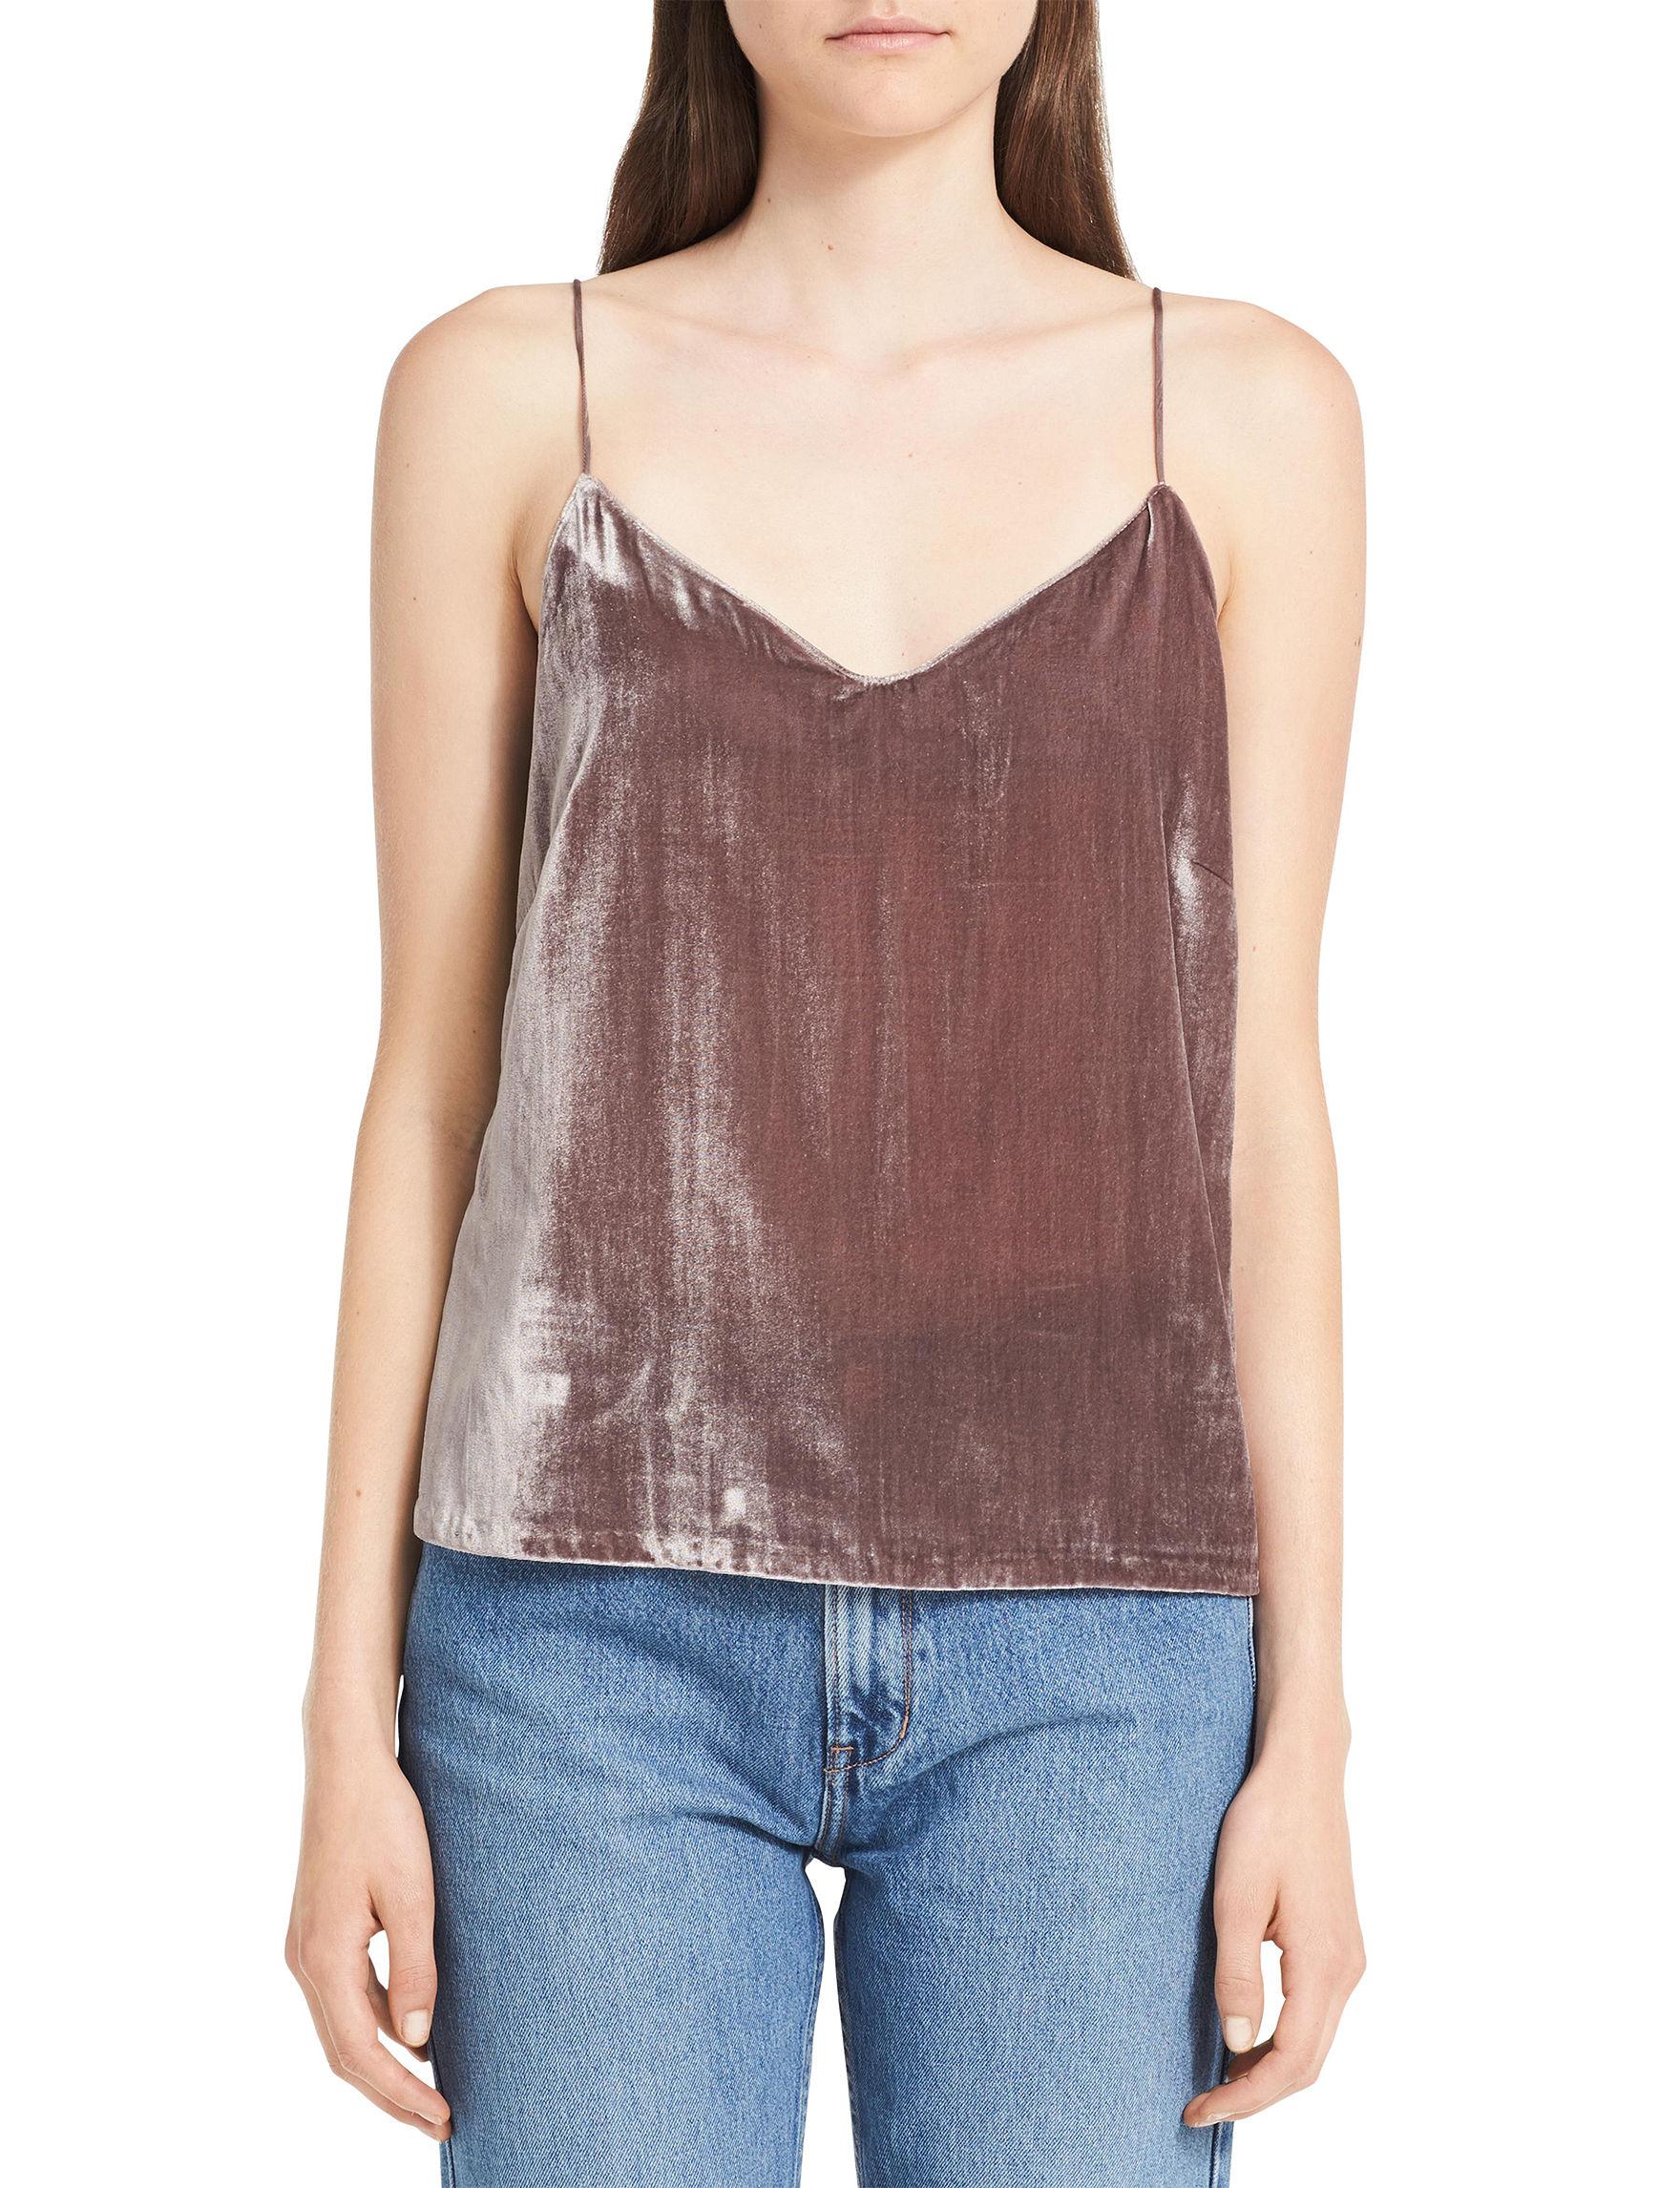 Calvin Klein Jeans Rosewood Tees & Tanks